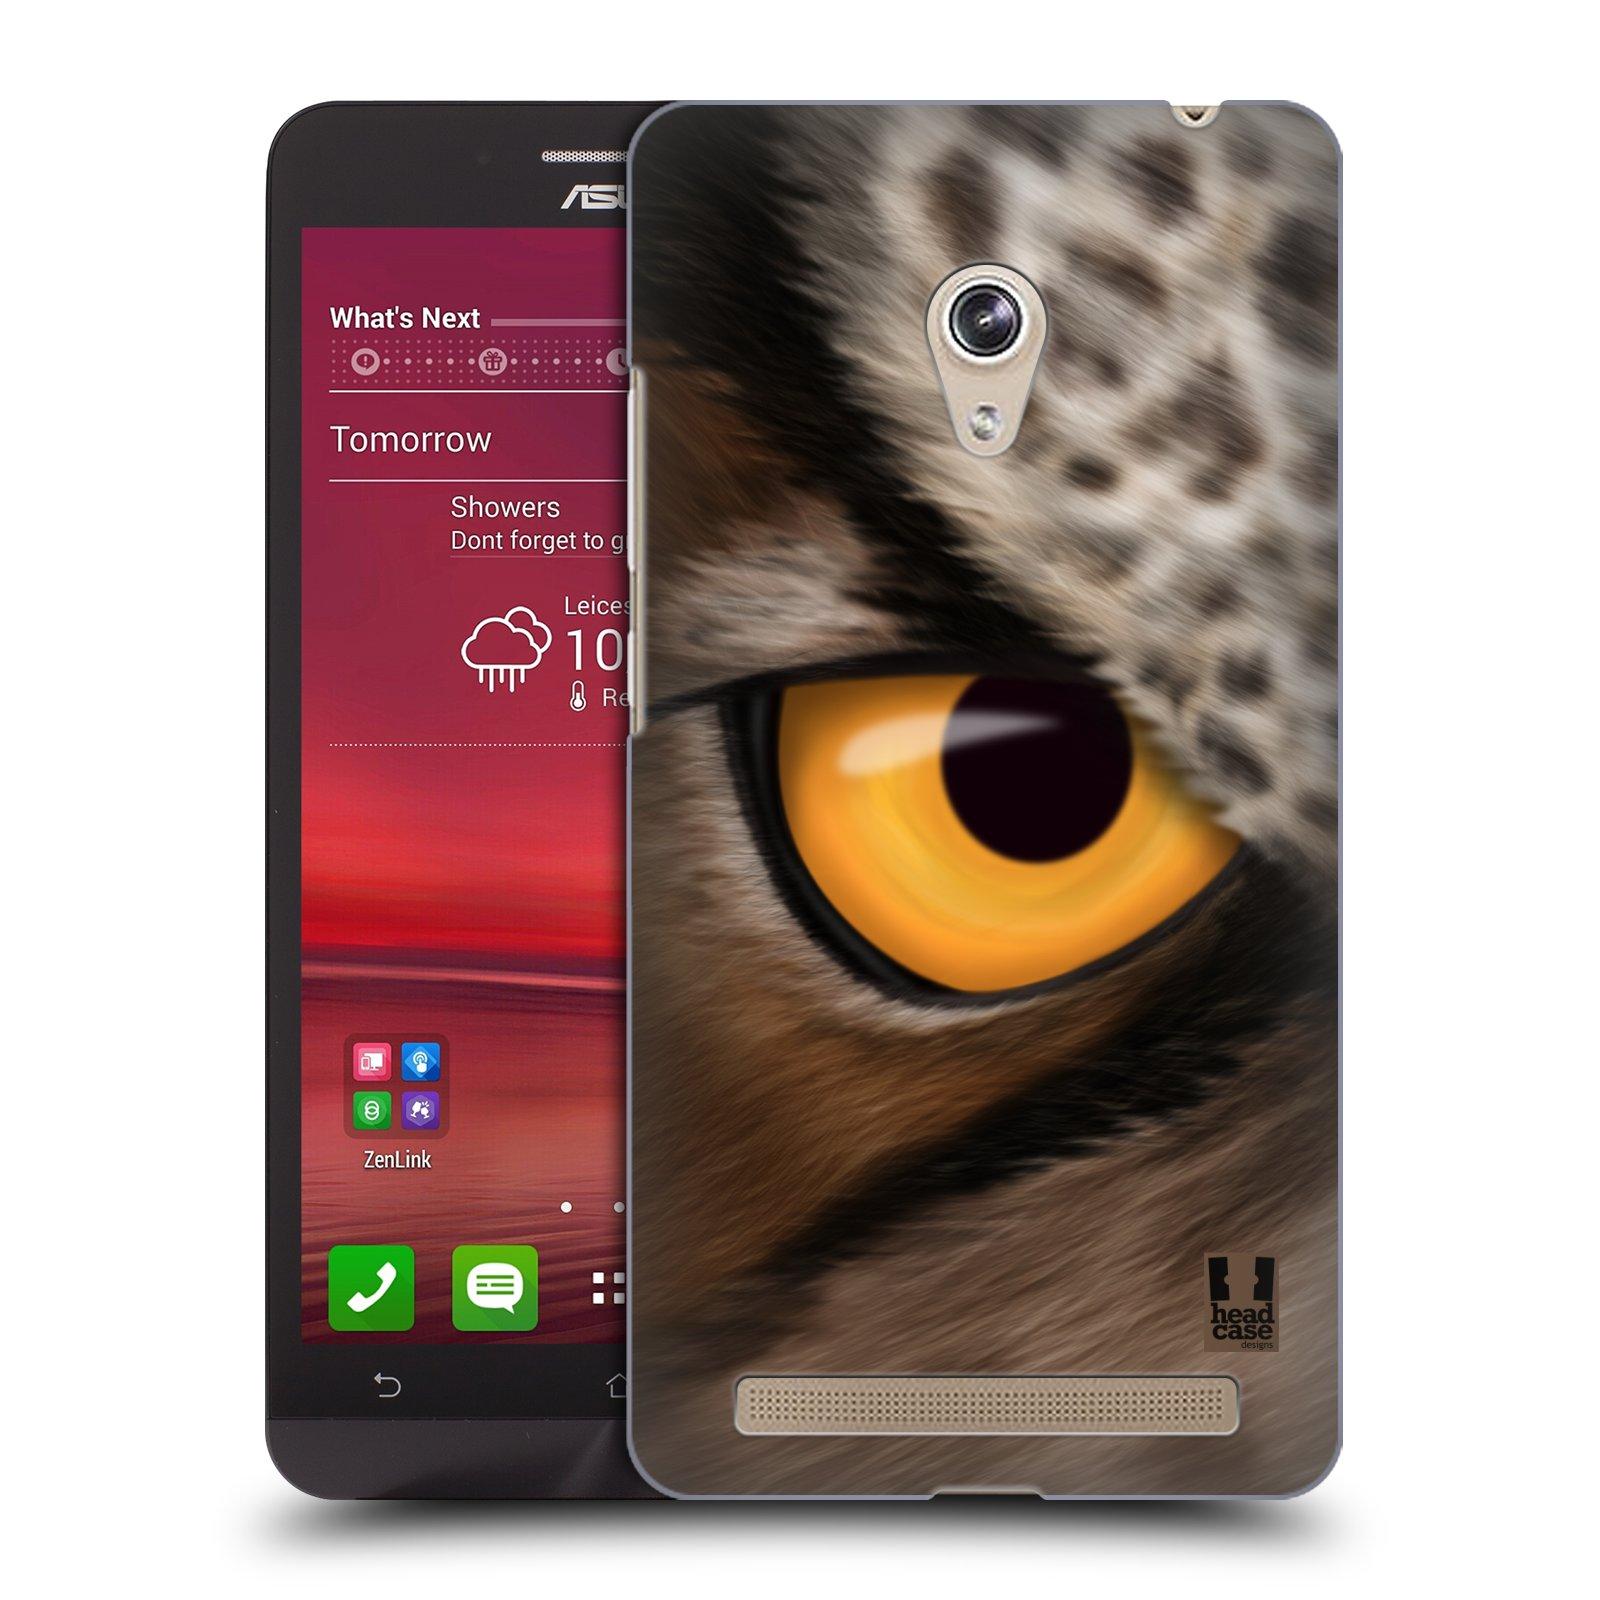 HEAD CASE plastový obal na mobil Asus Zenfone 6 vzor pohled zvířete oko sova